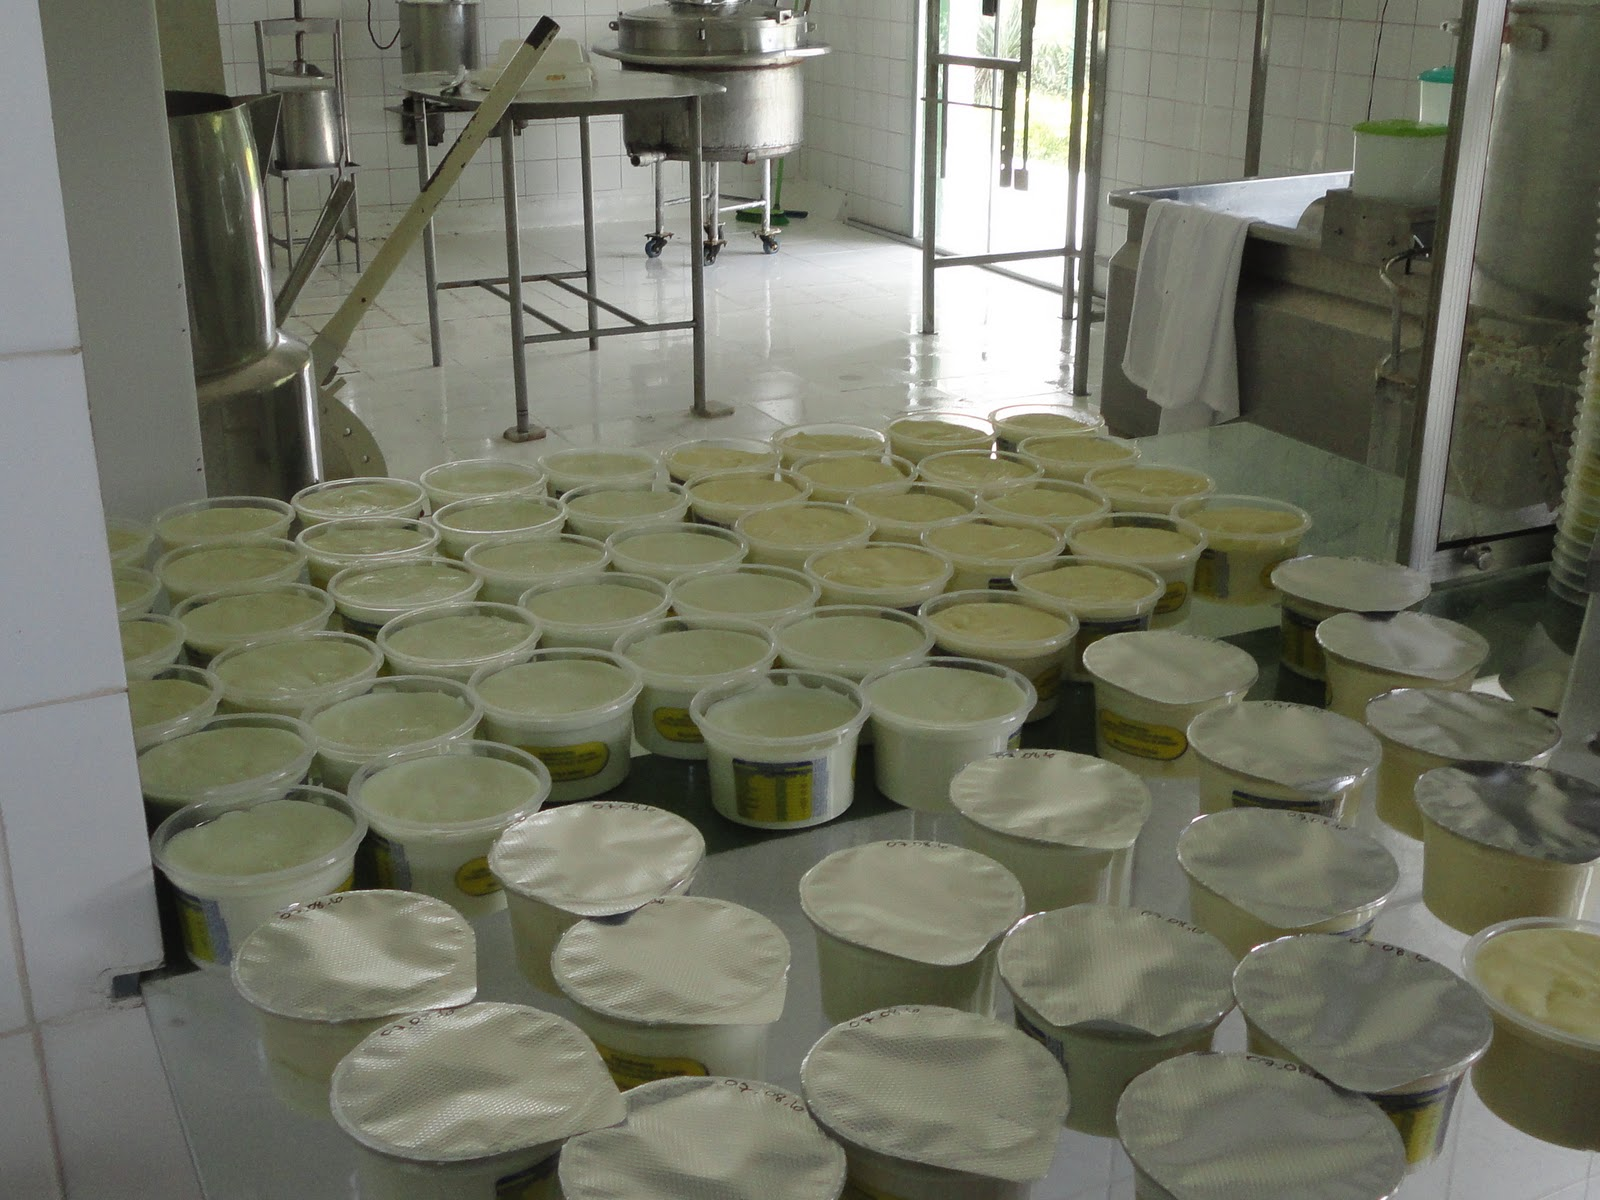 fazenda e queijaria Mironga